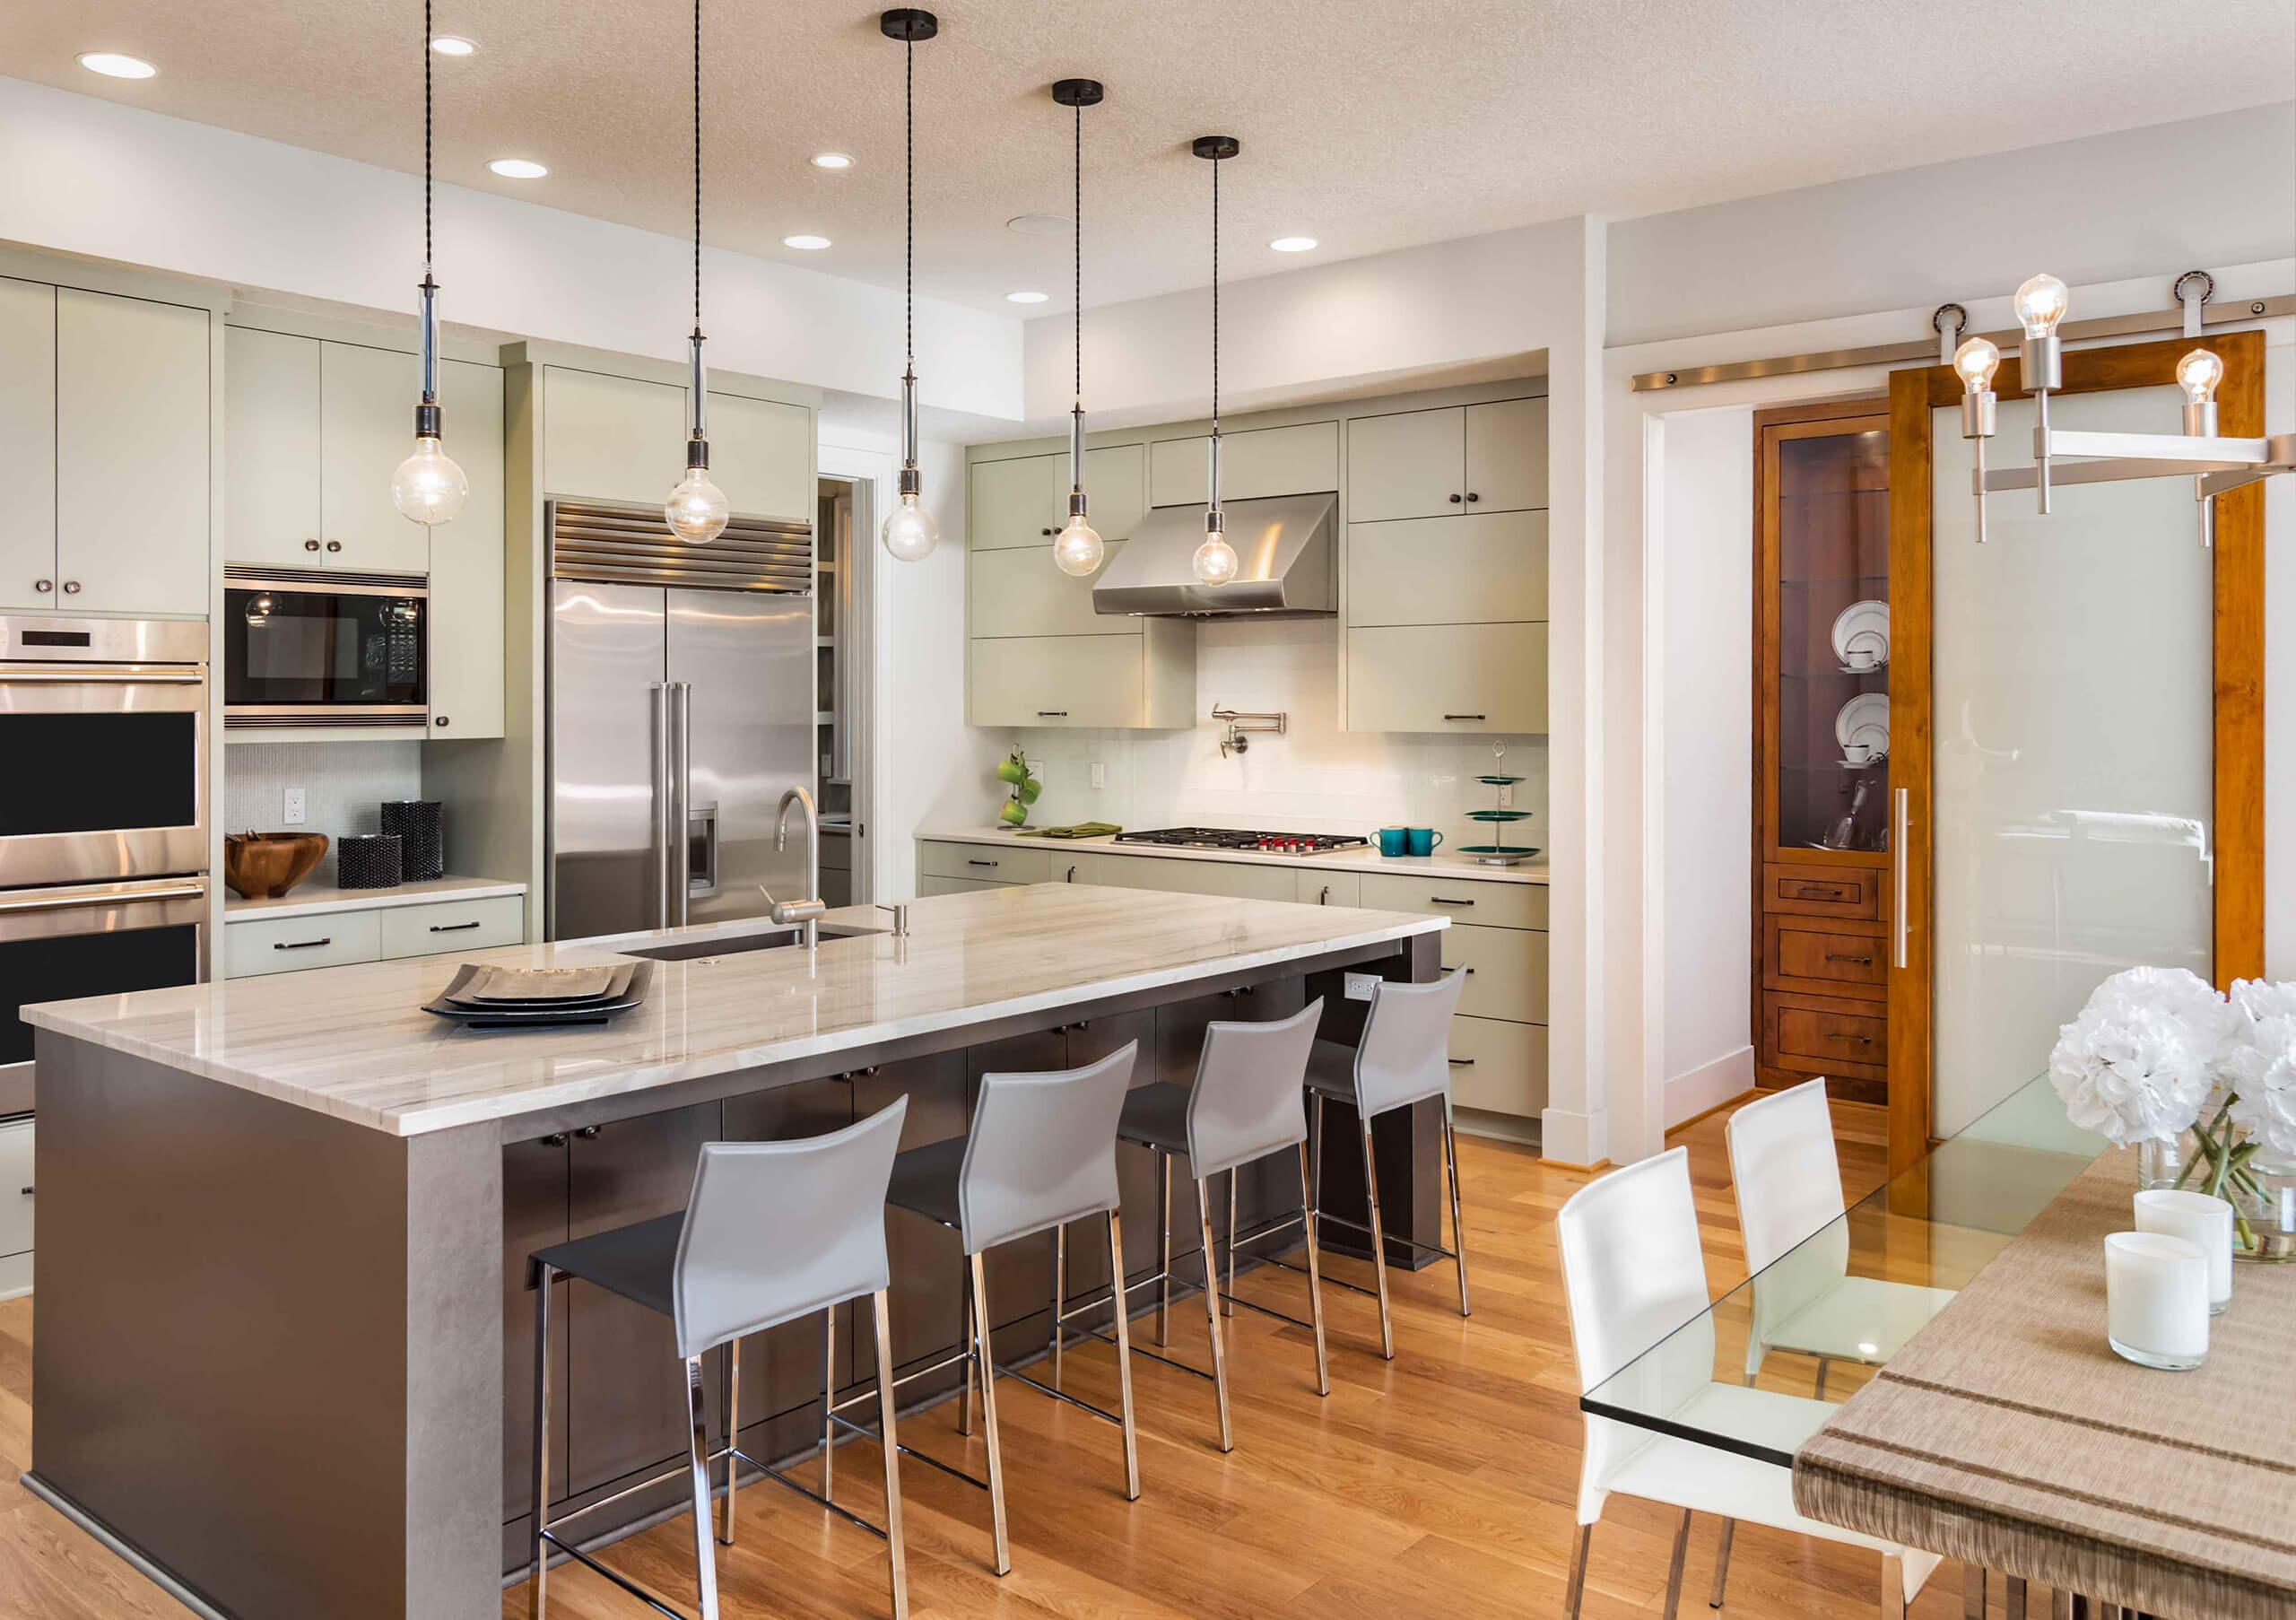 kitchen remodeling contractor los angeles : countertops, cabinets, floor